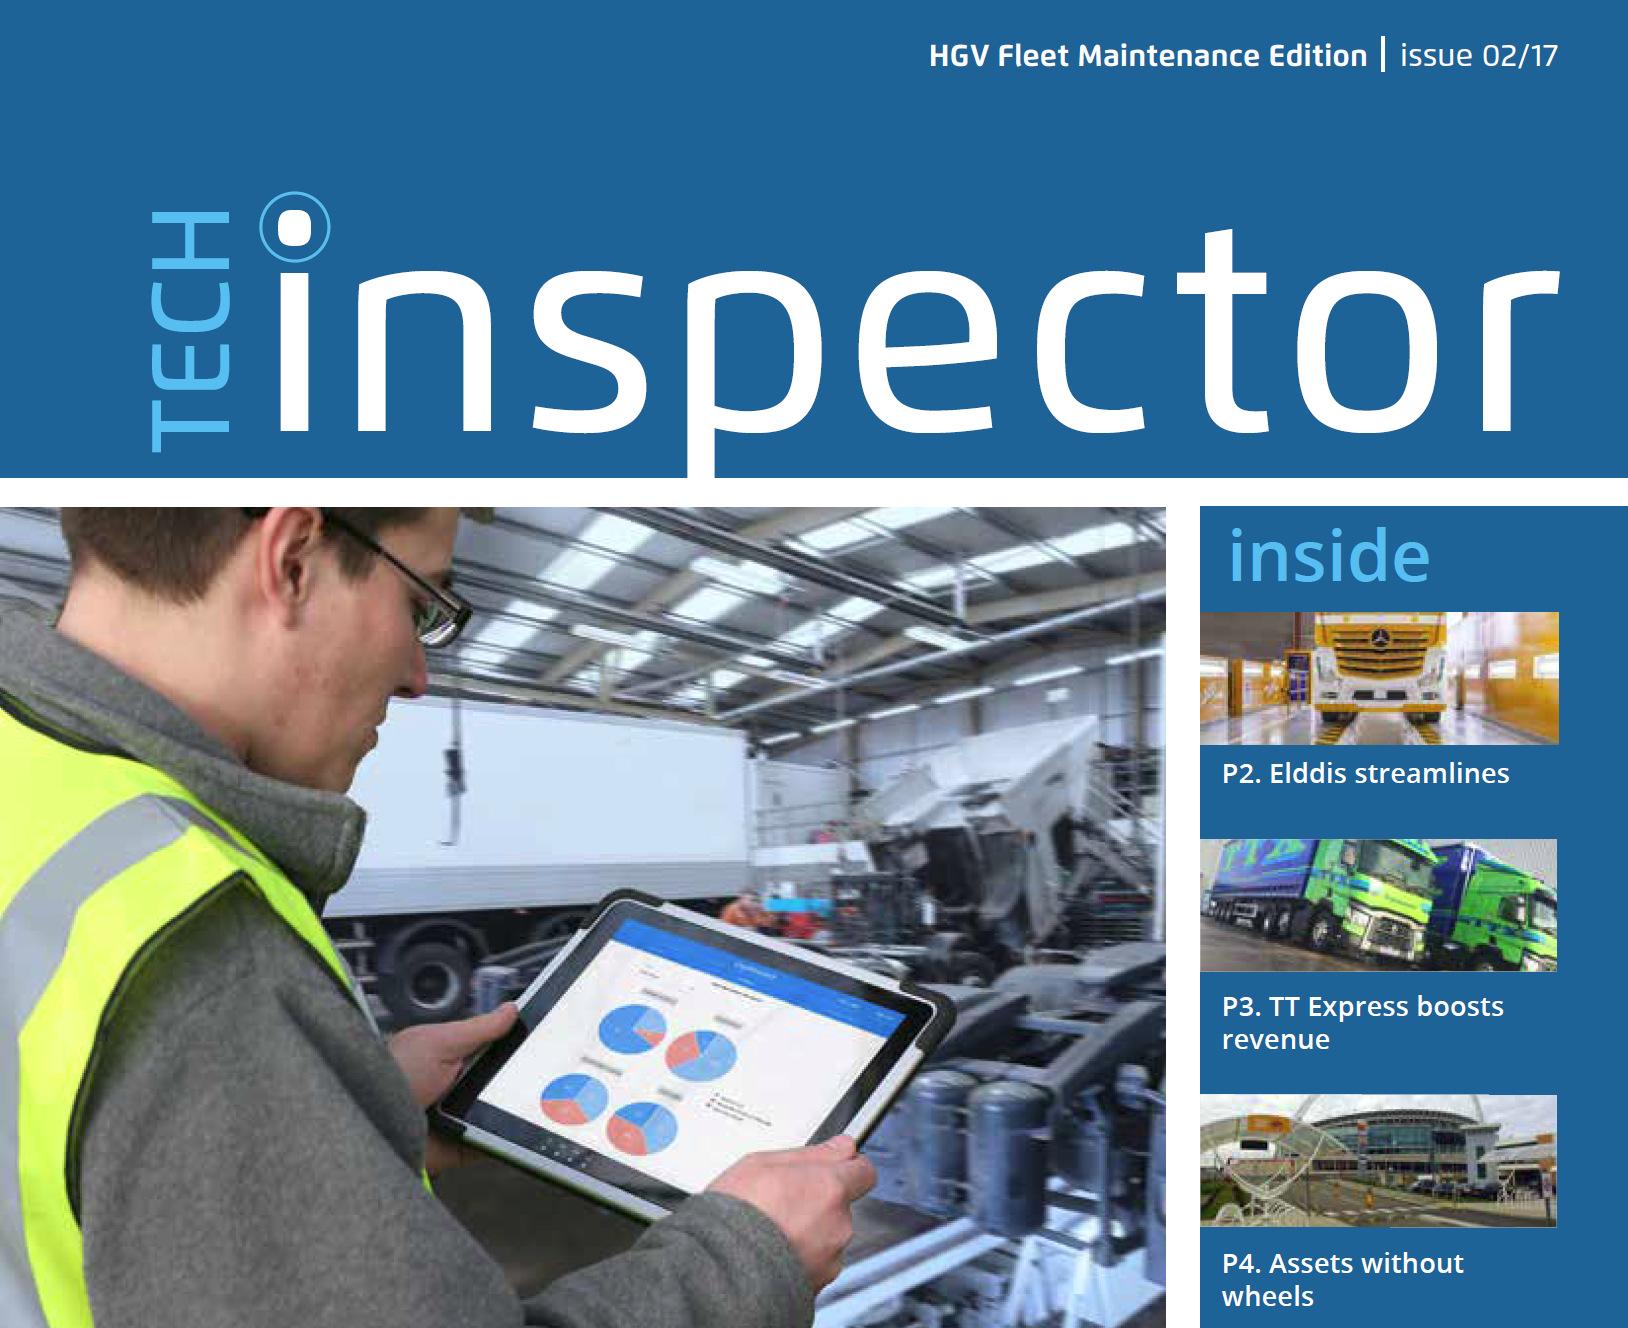 HGV Fleet Maintenance Edition issue 02/17